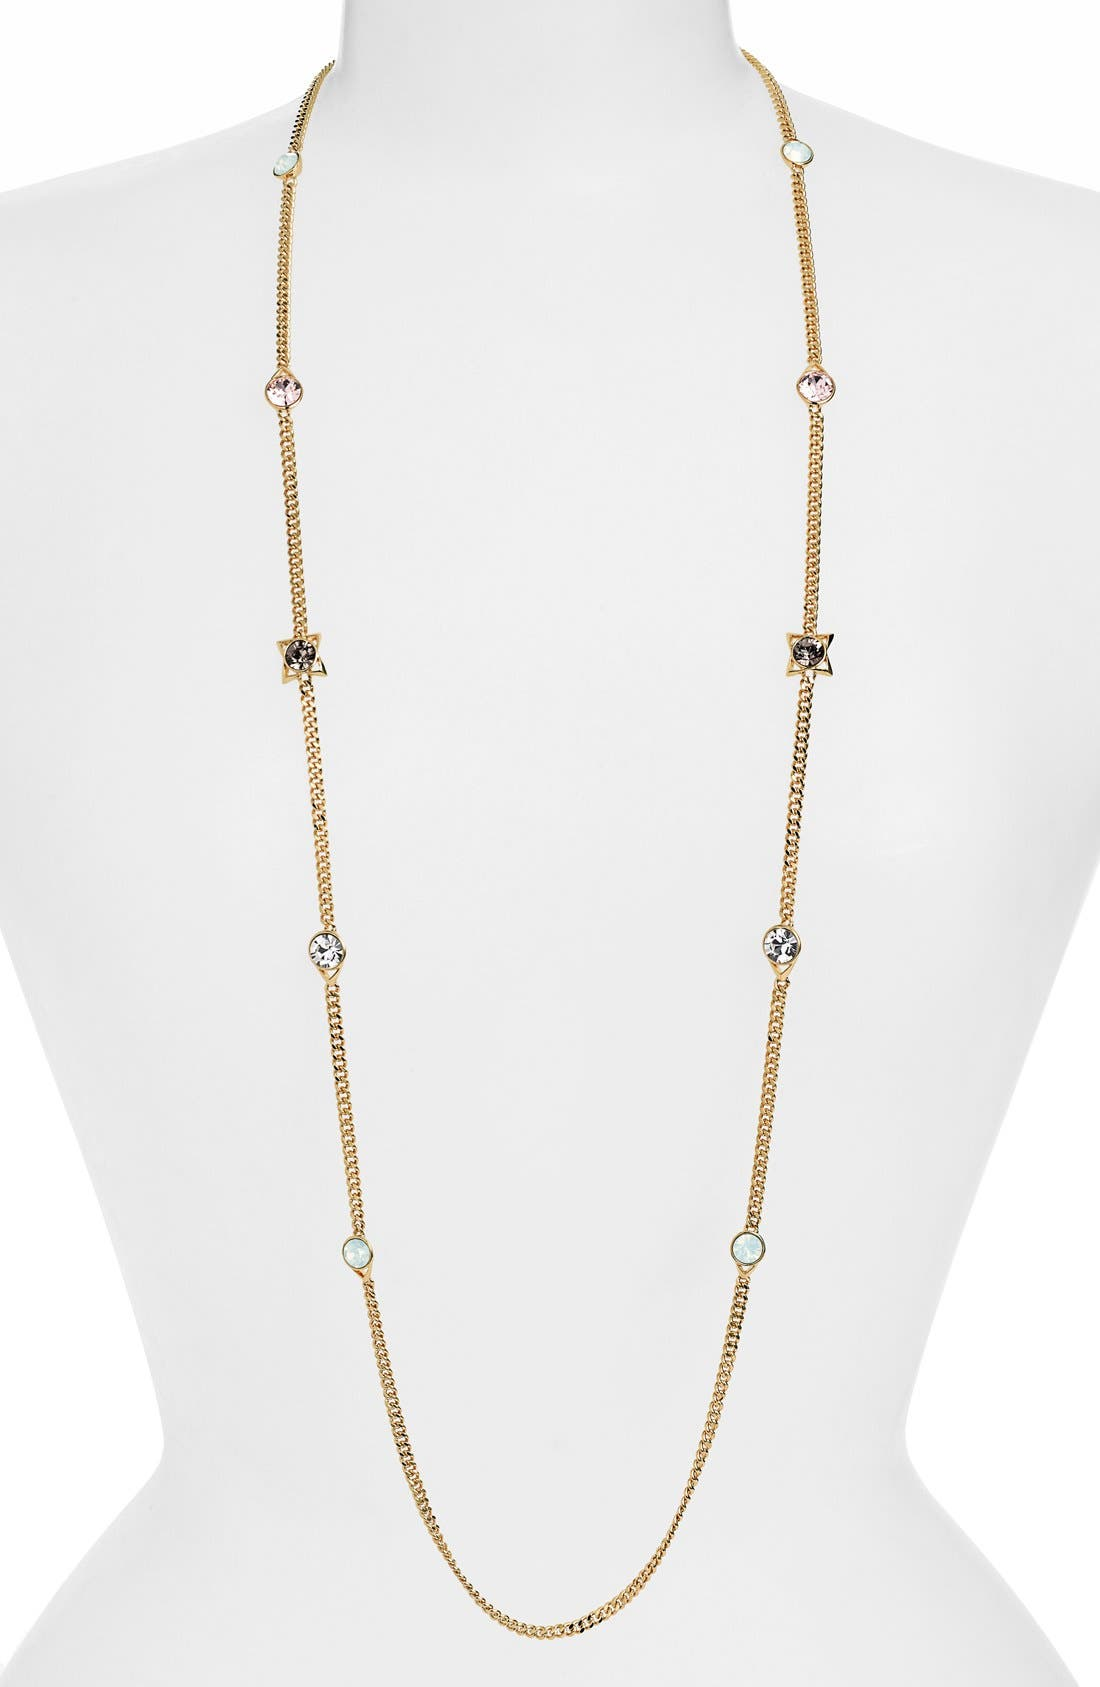 Main Image - Givenchy Long Station Necklace